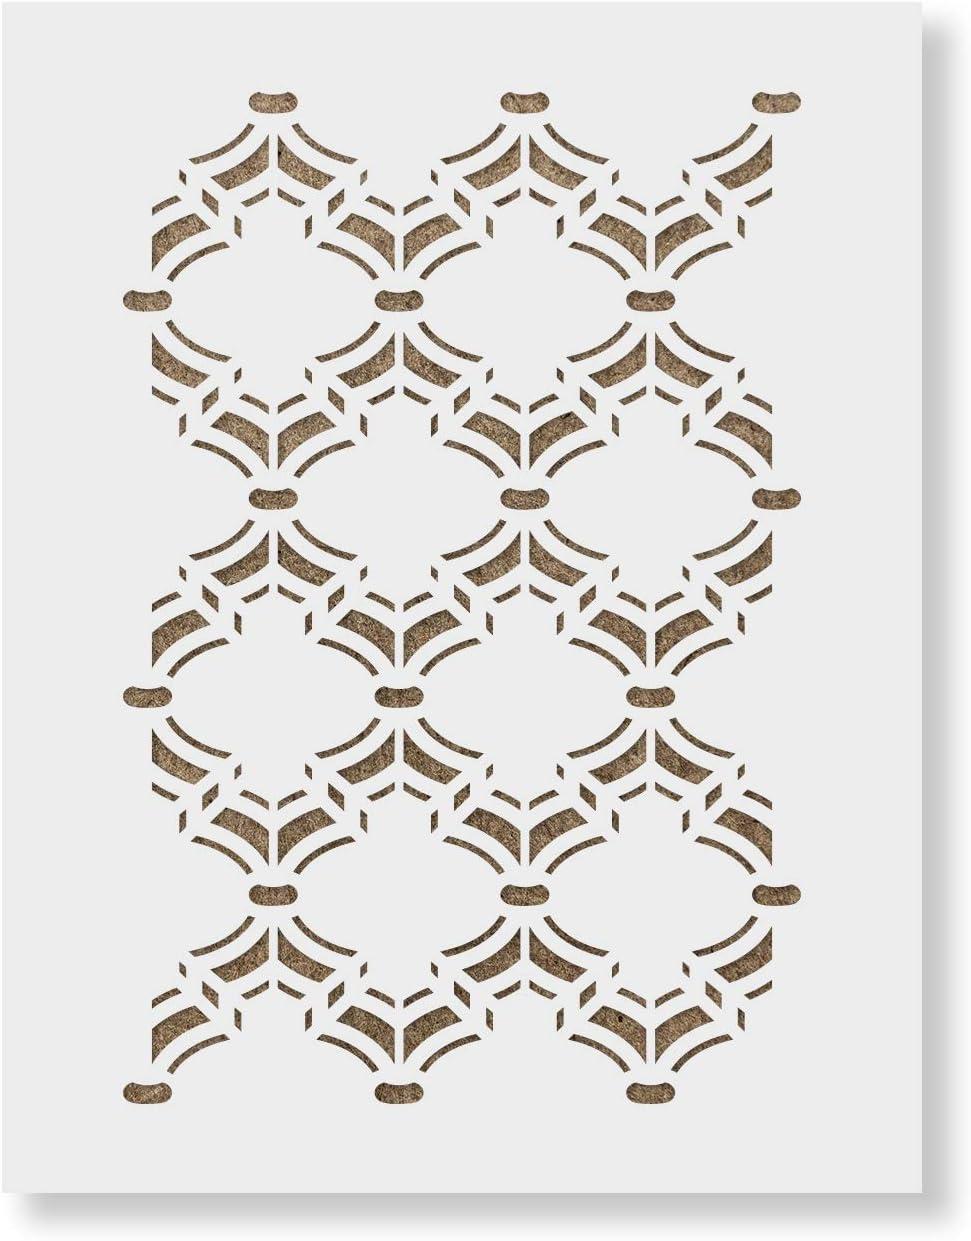 "34.5/"" x 20.5/"" Size Damask Floral Stencil Durable /& Reusable Wall Stencils"